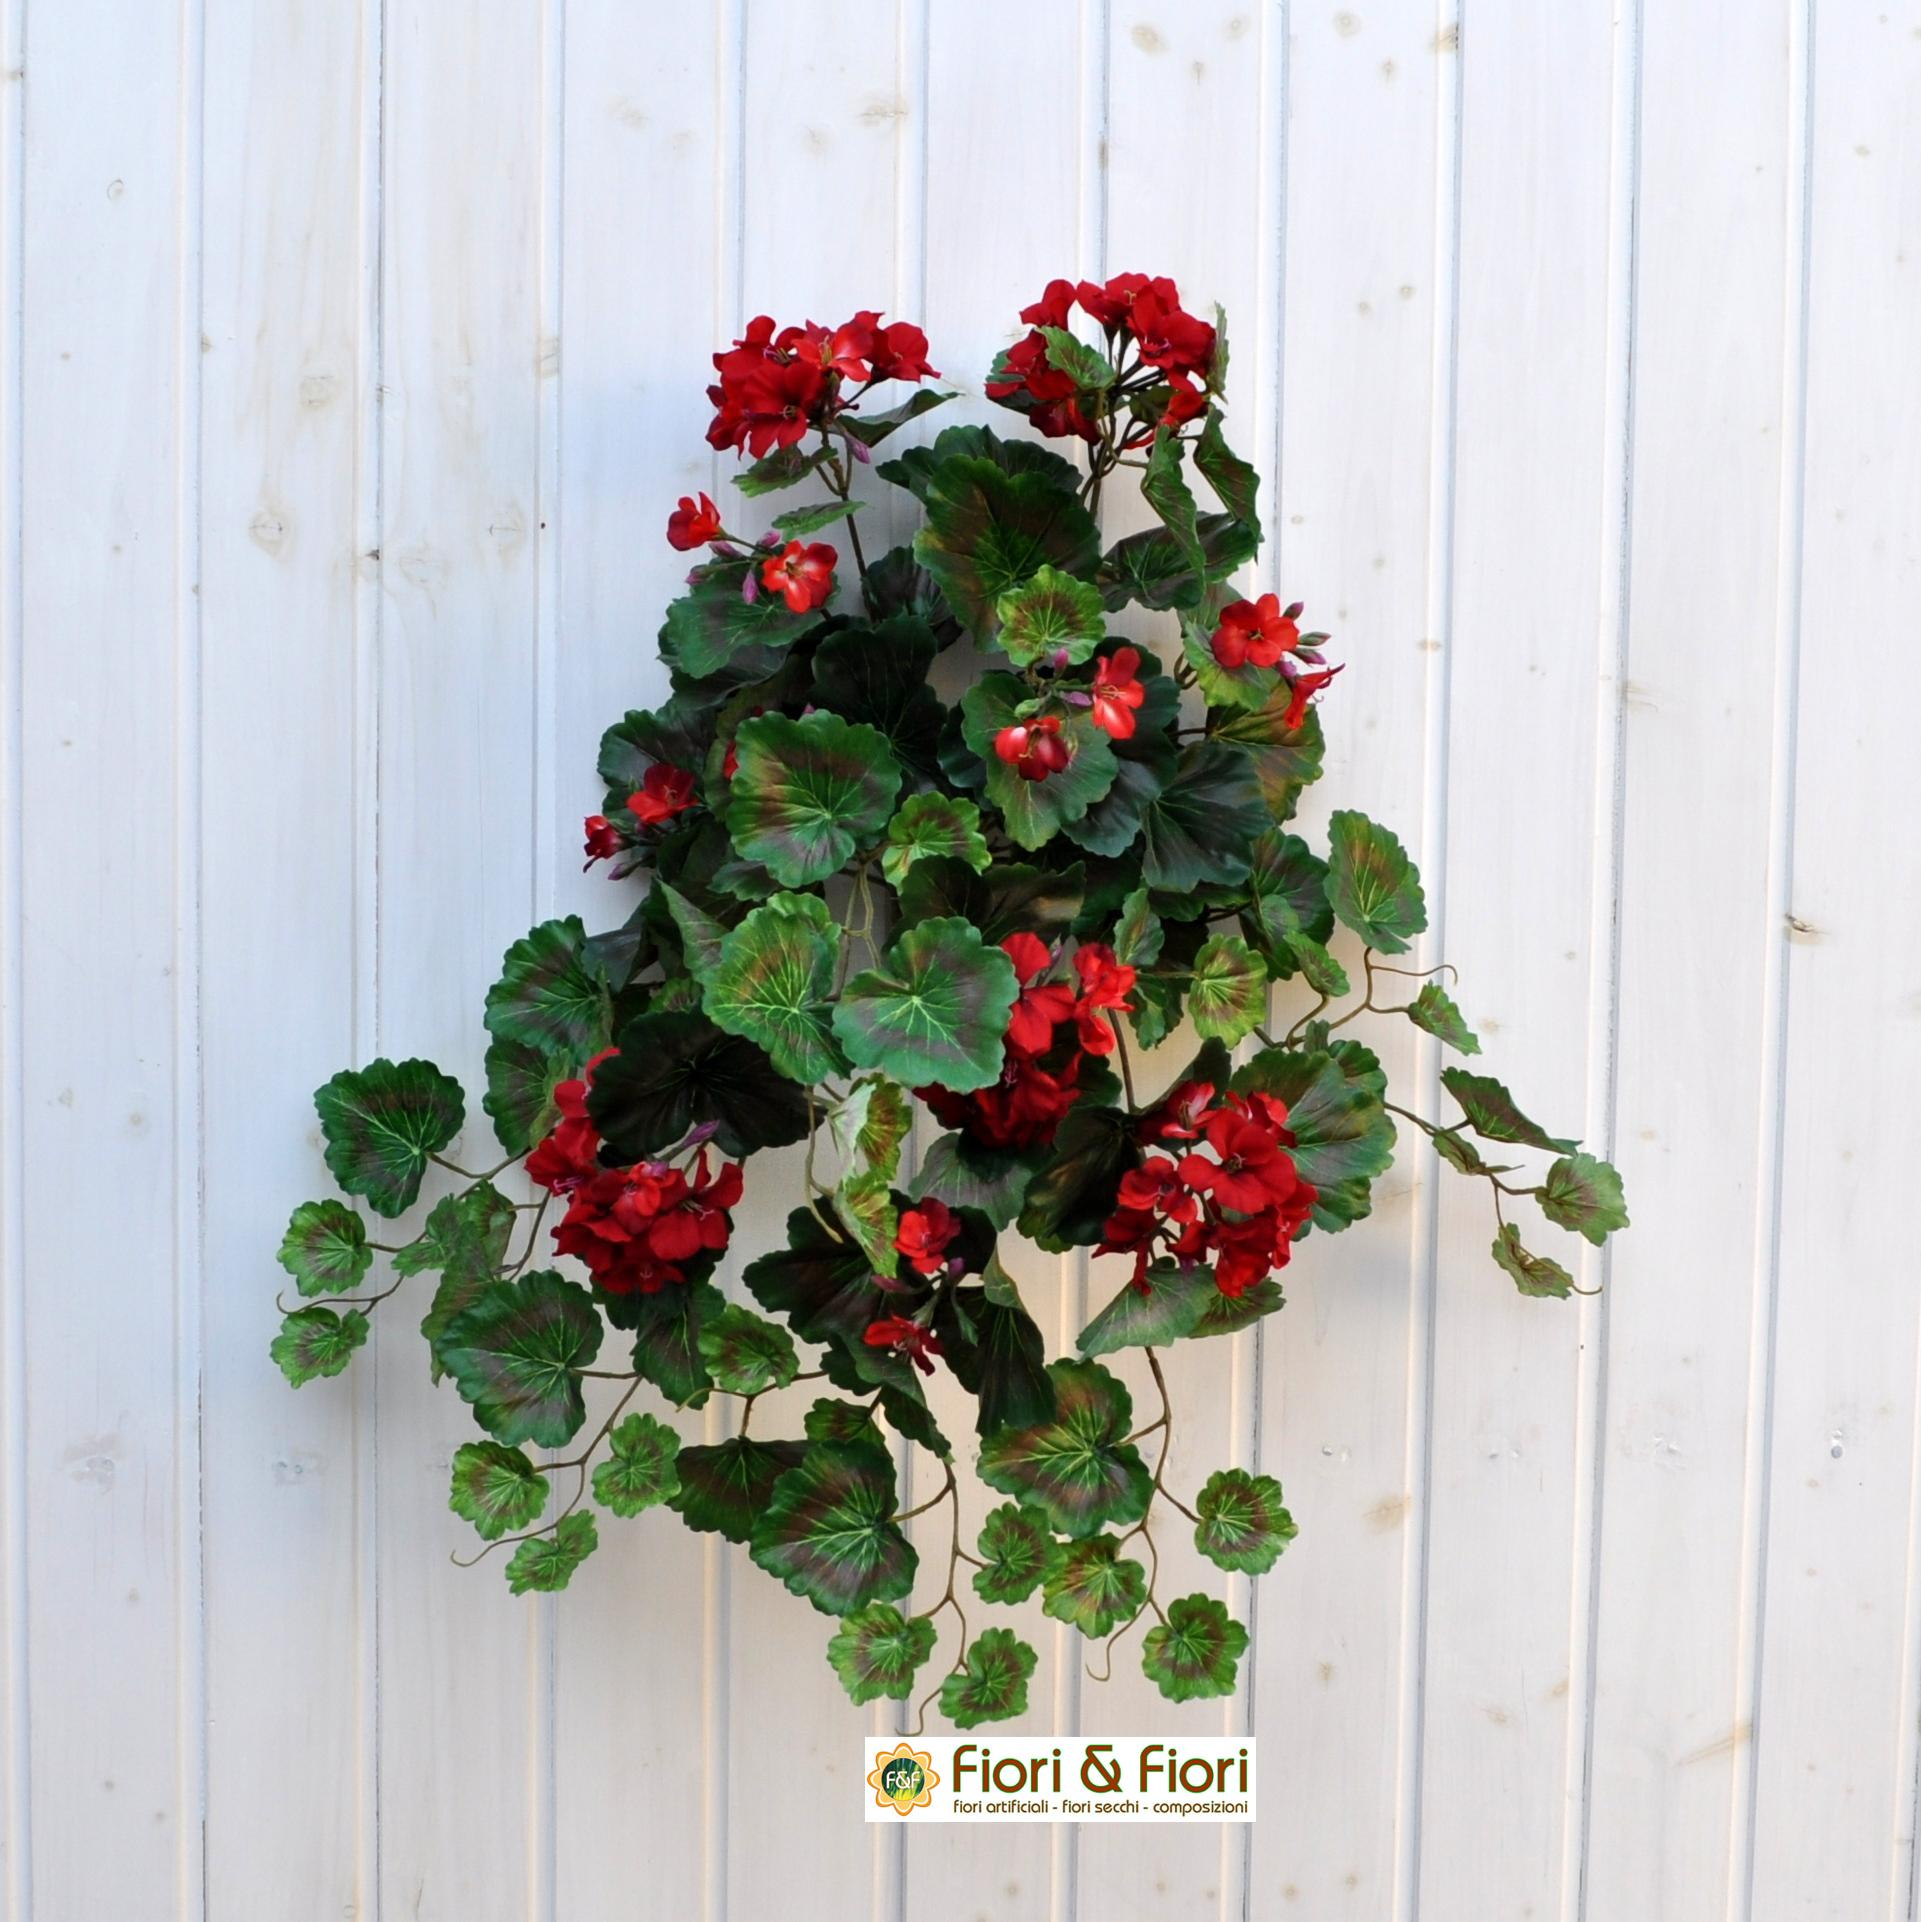 Piante Artificiali Da Esterno : Geranio artificiale pelargonium cadente rosso per balconi